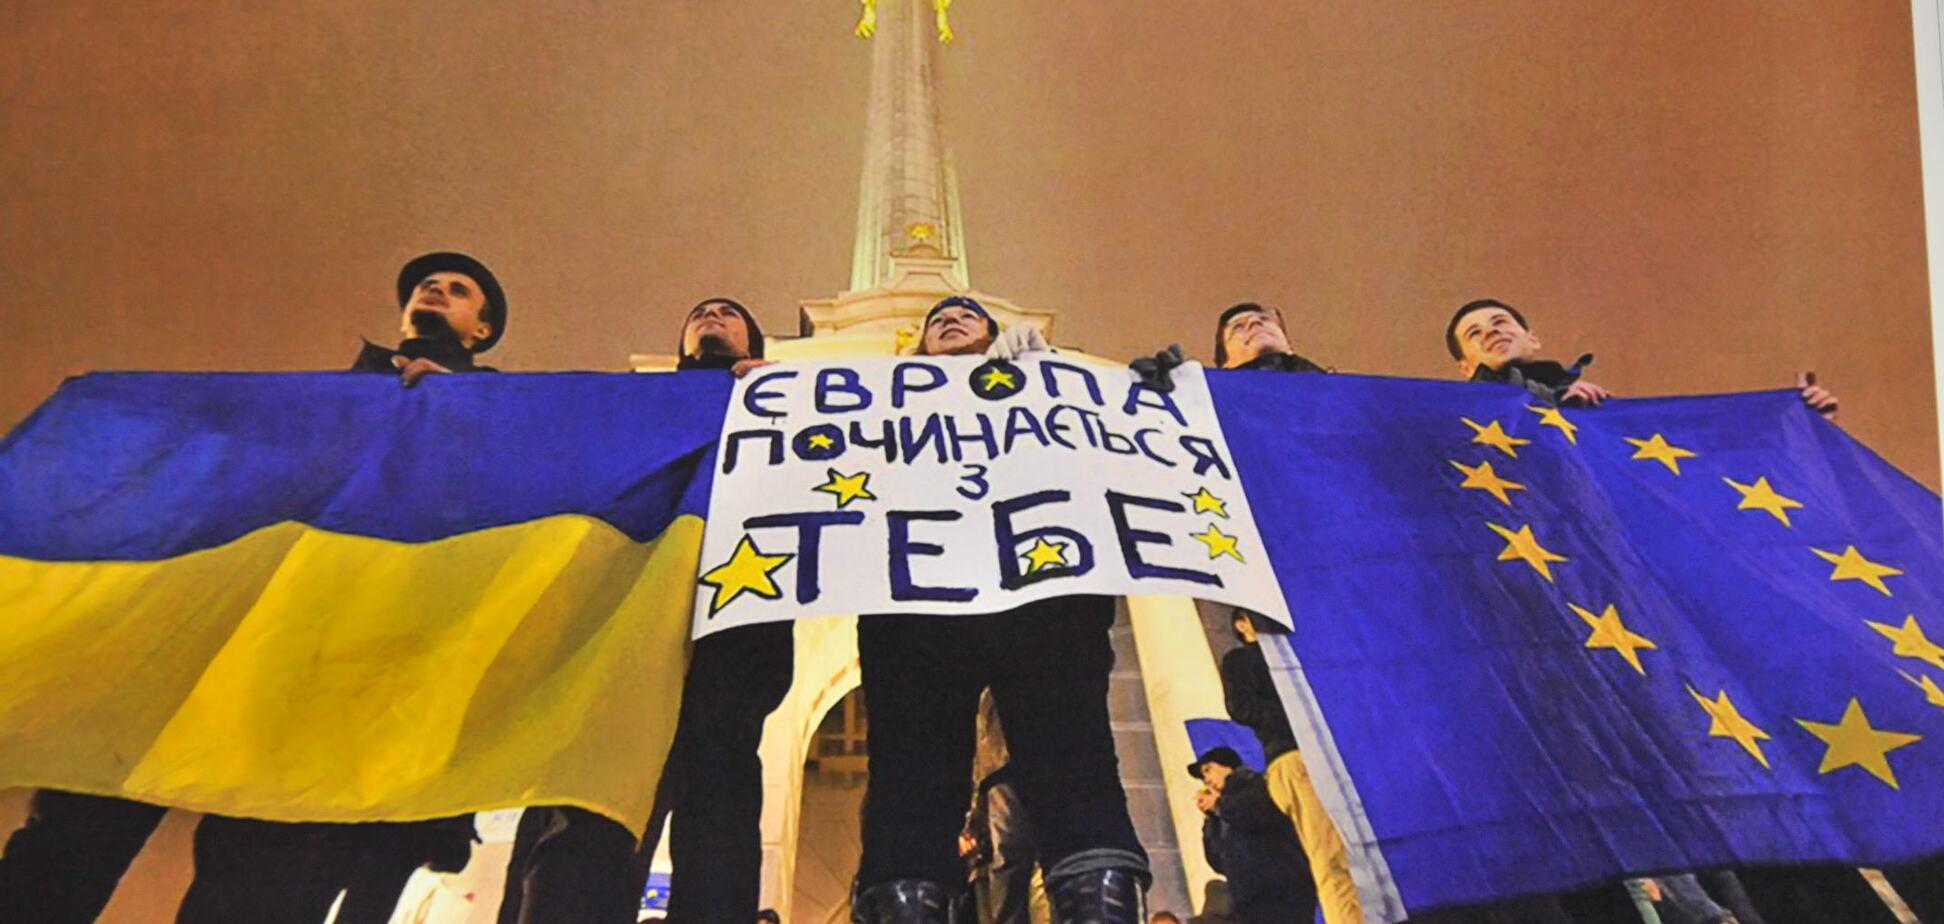 Нова українська еліта загралася і зависла